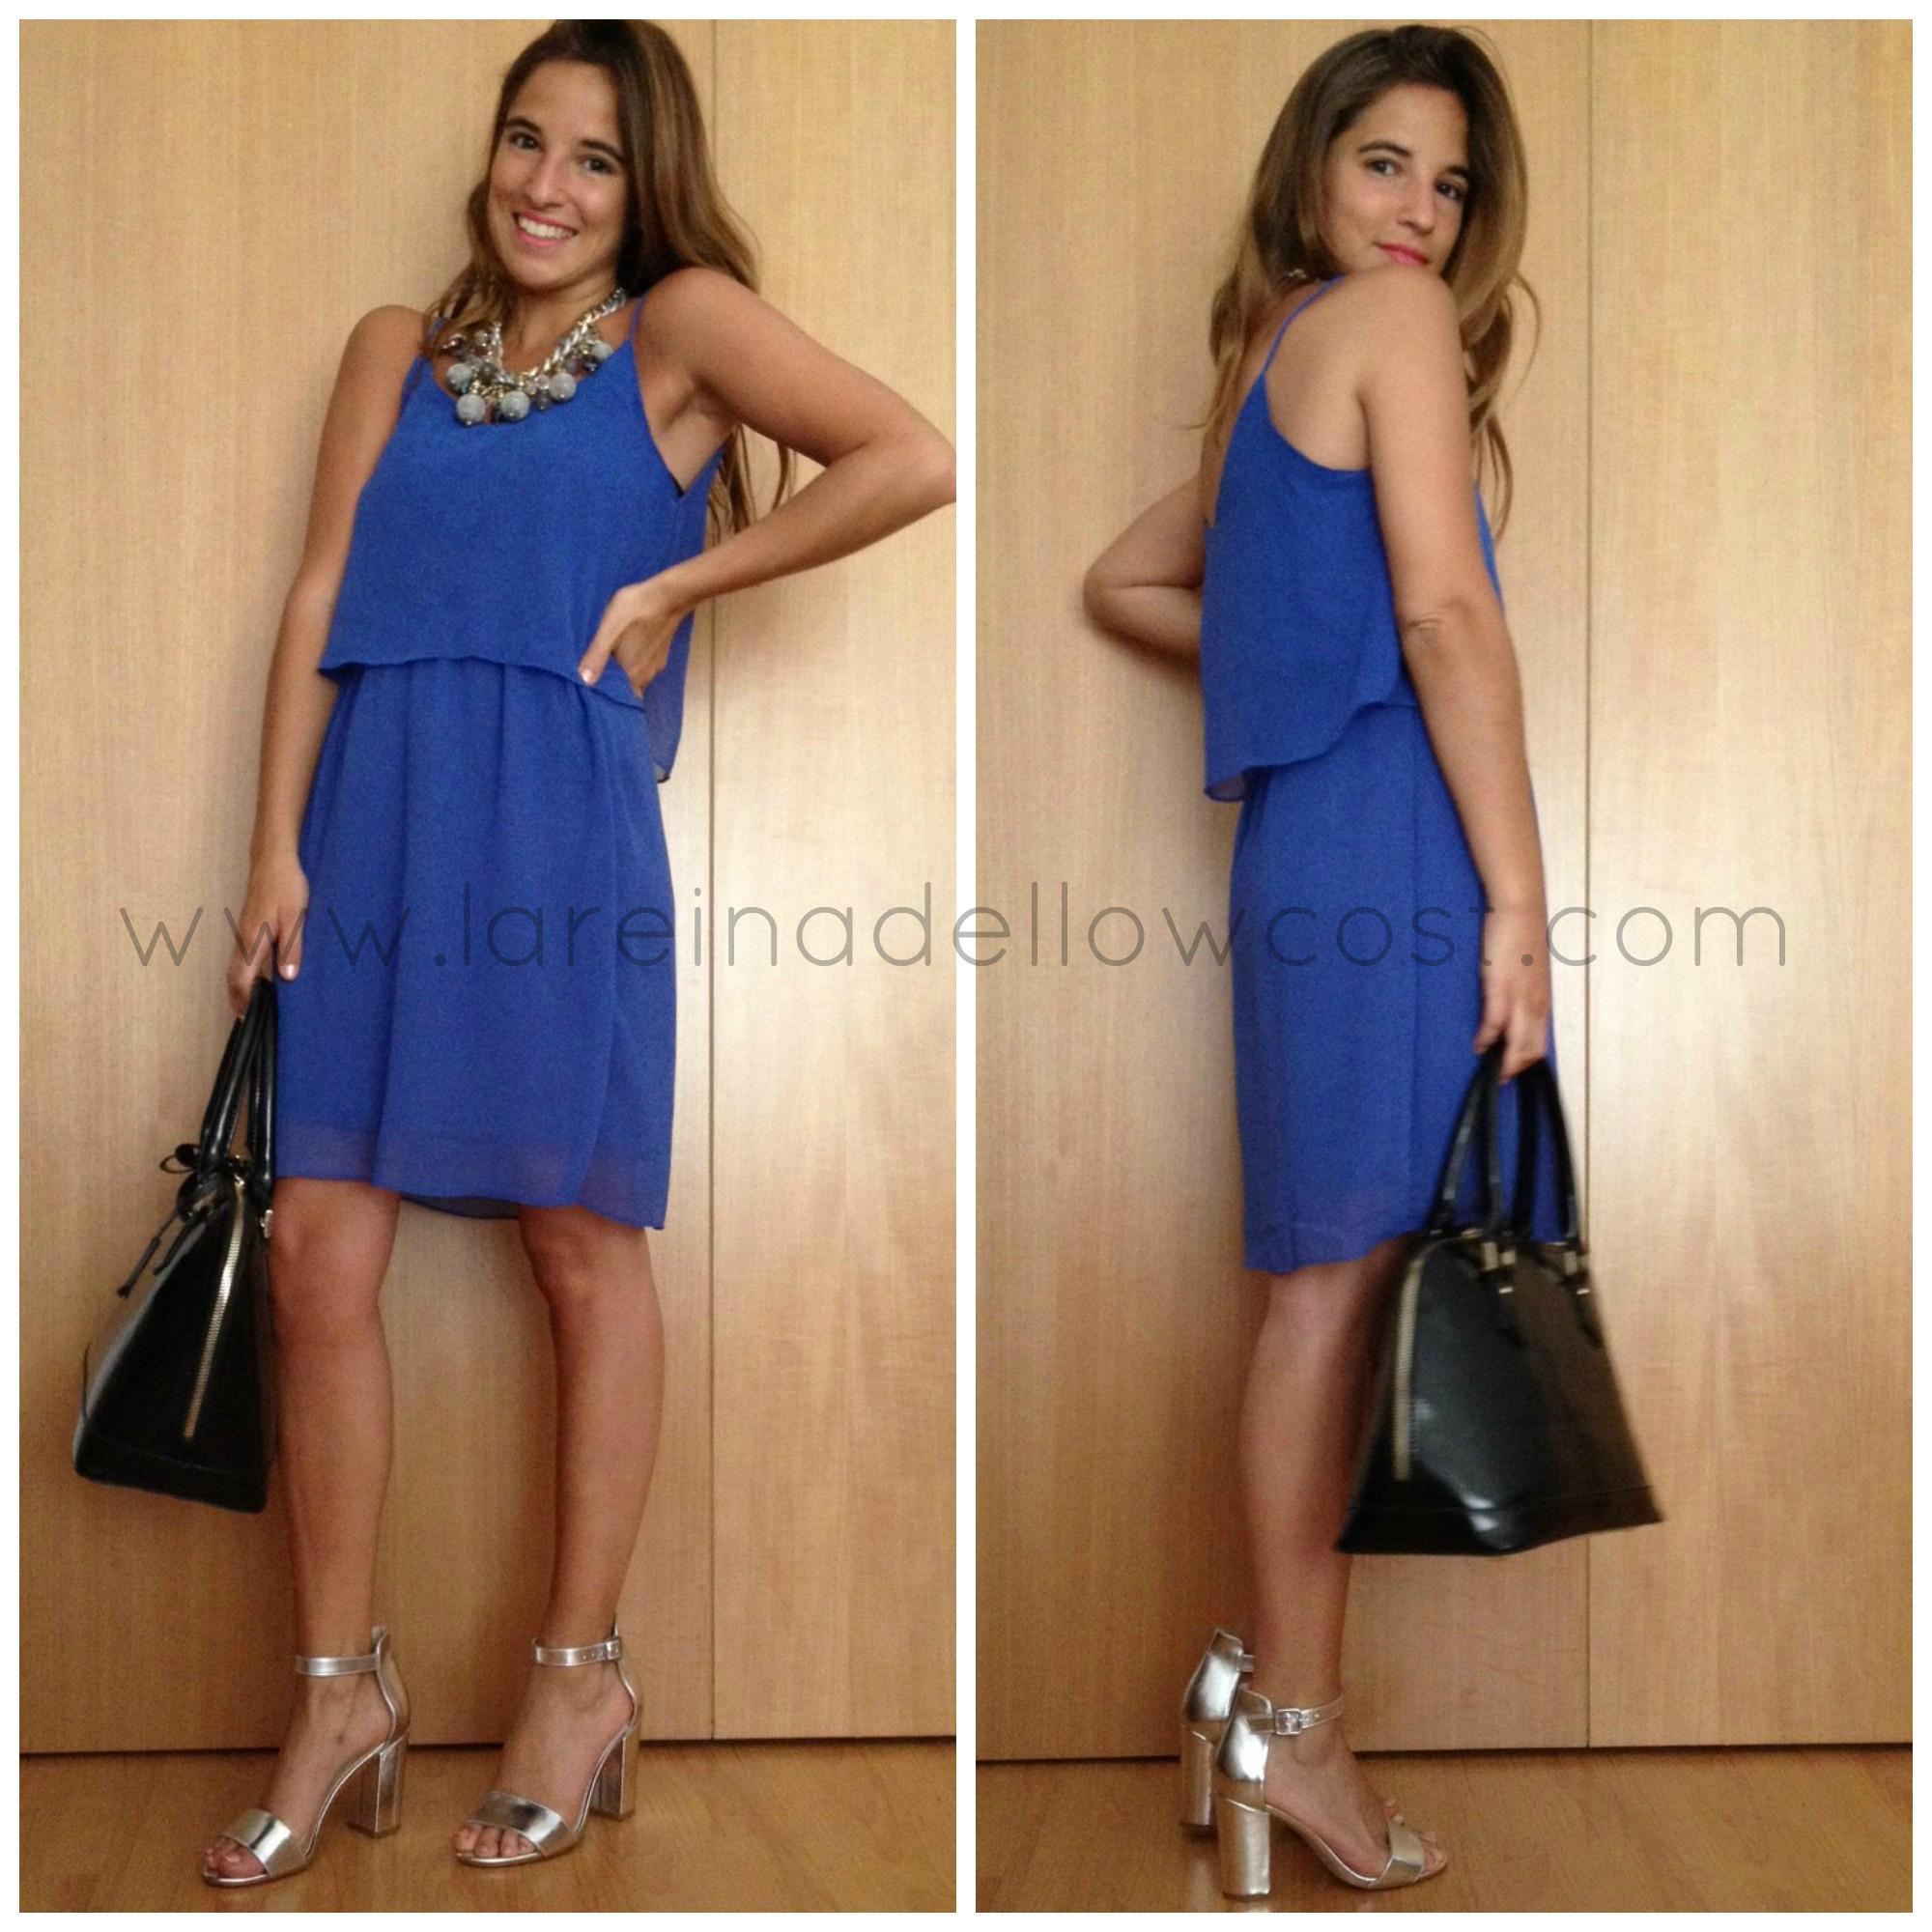 5ca1526e23 Vestido azul klein y complementos dorados - Vestido azul